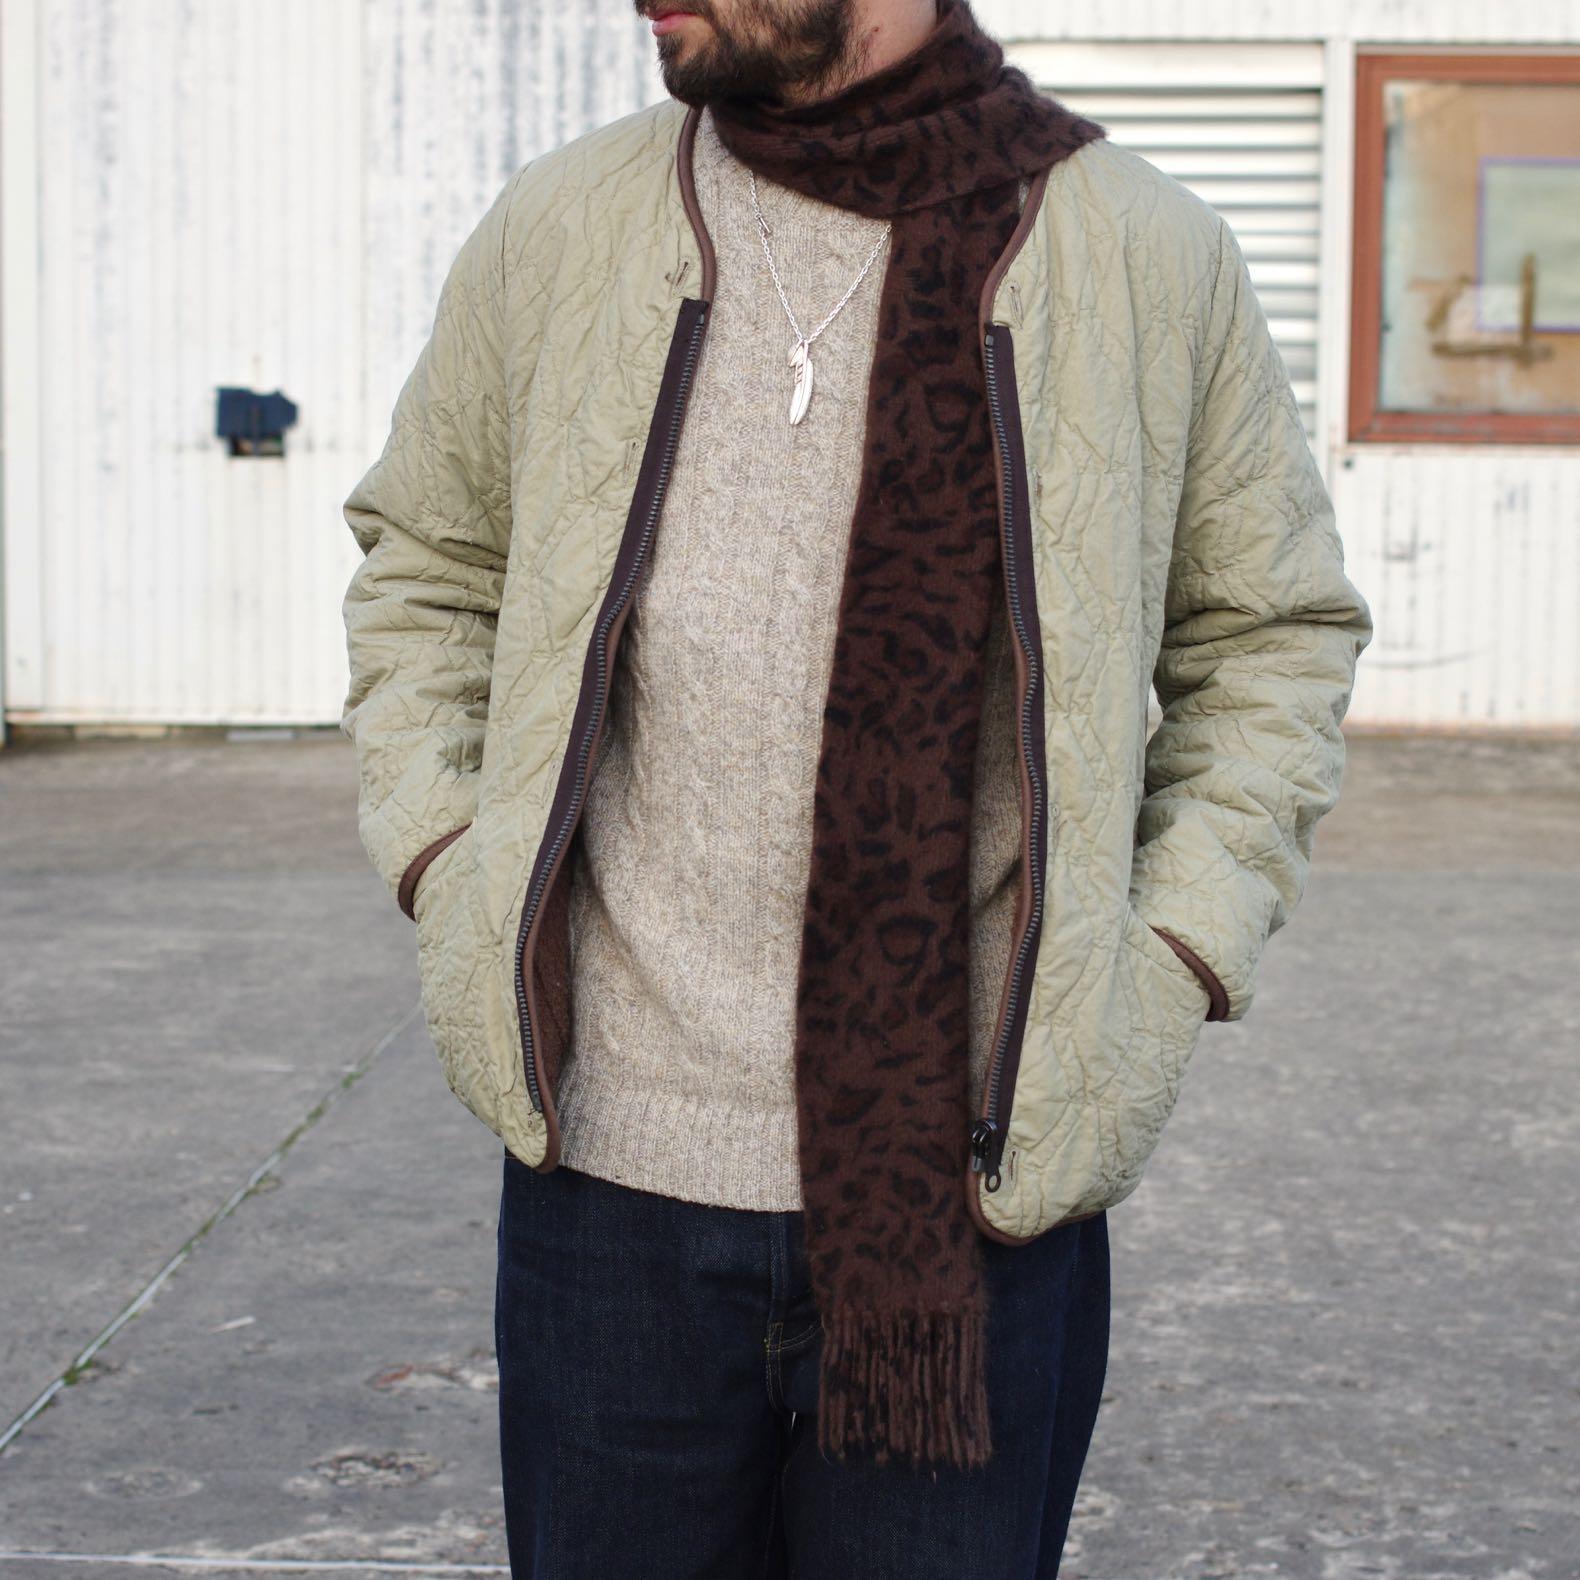 idée tenue homme hiver avec pull liane torsadé aran iles